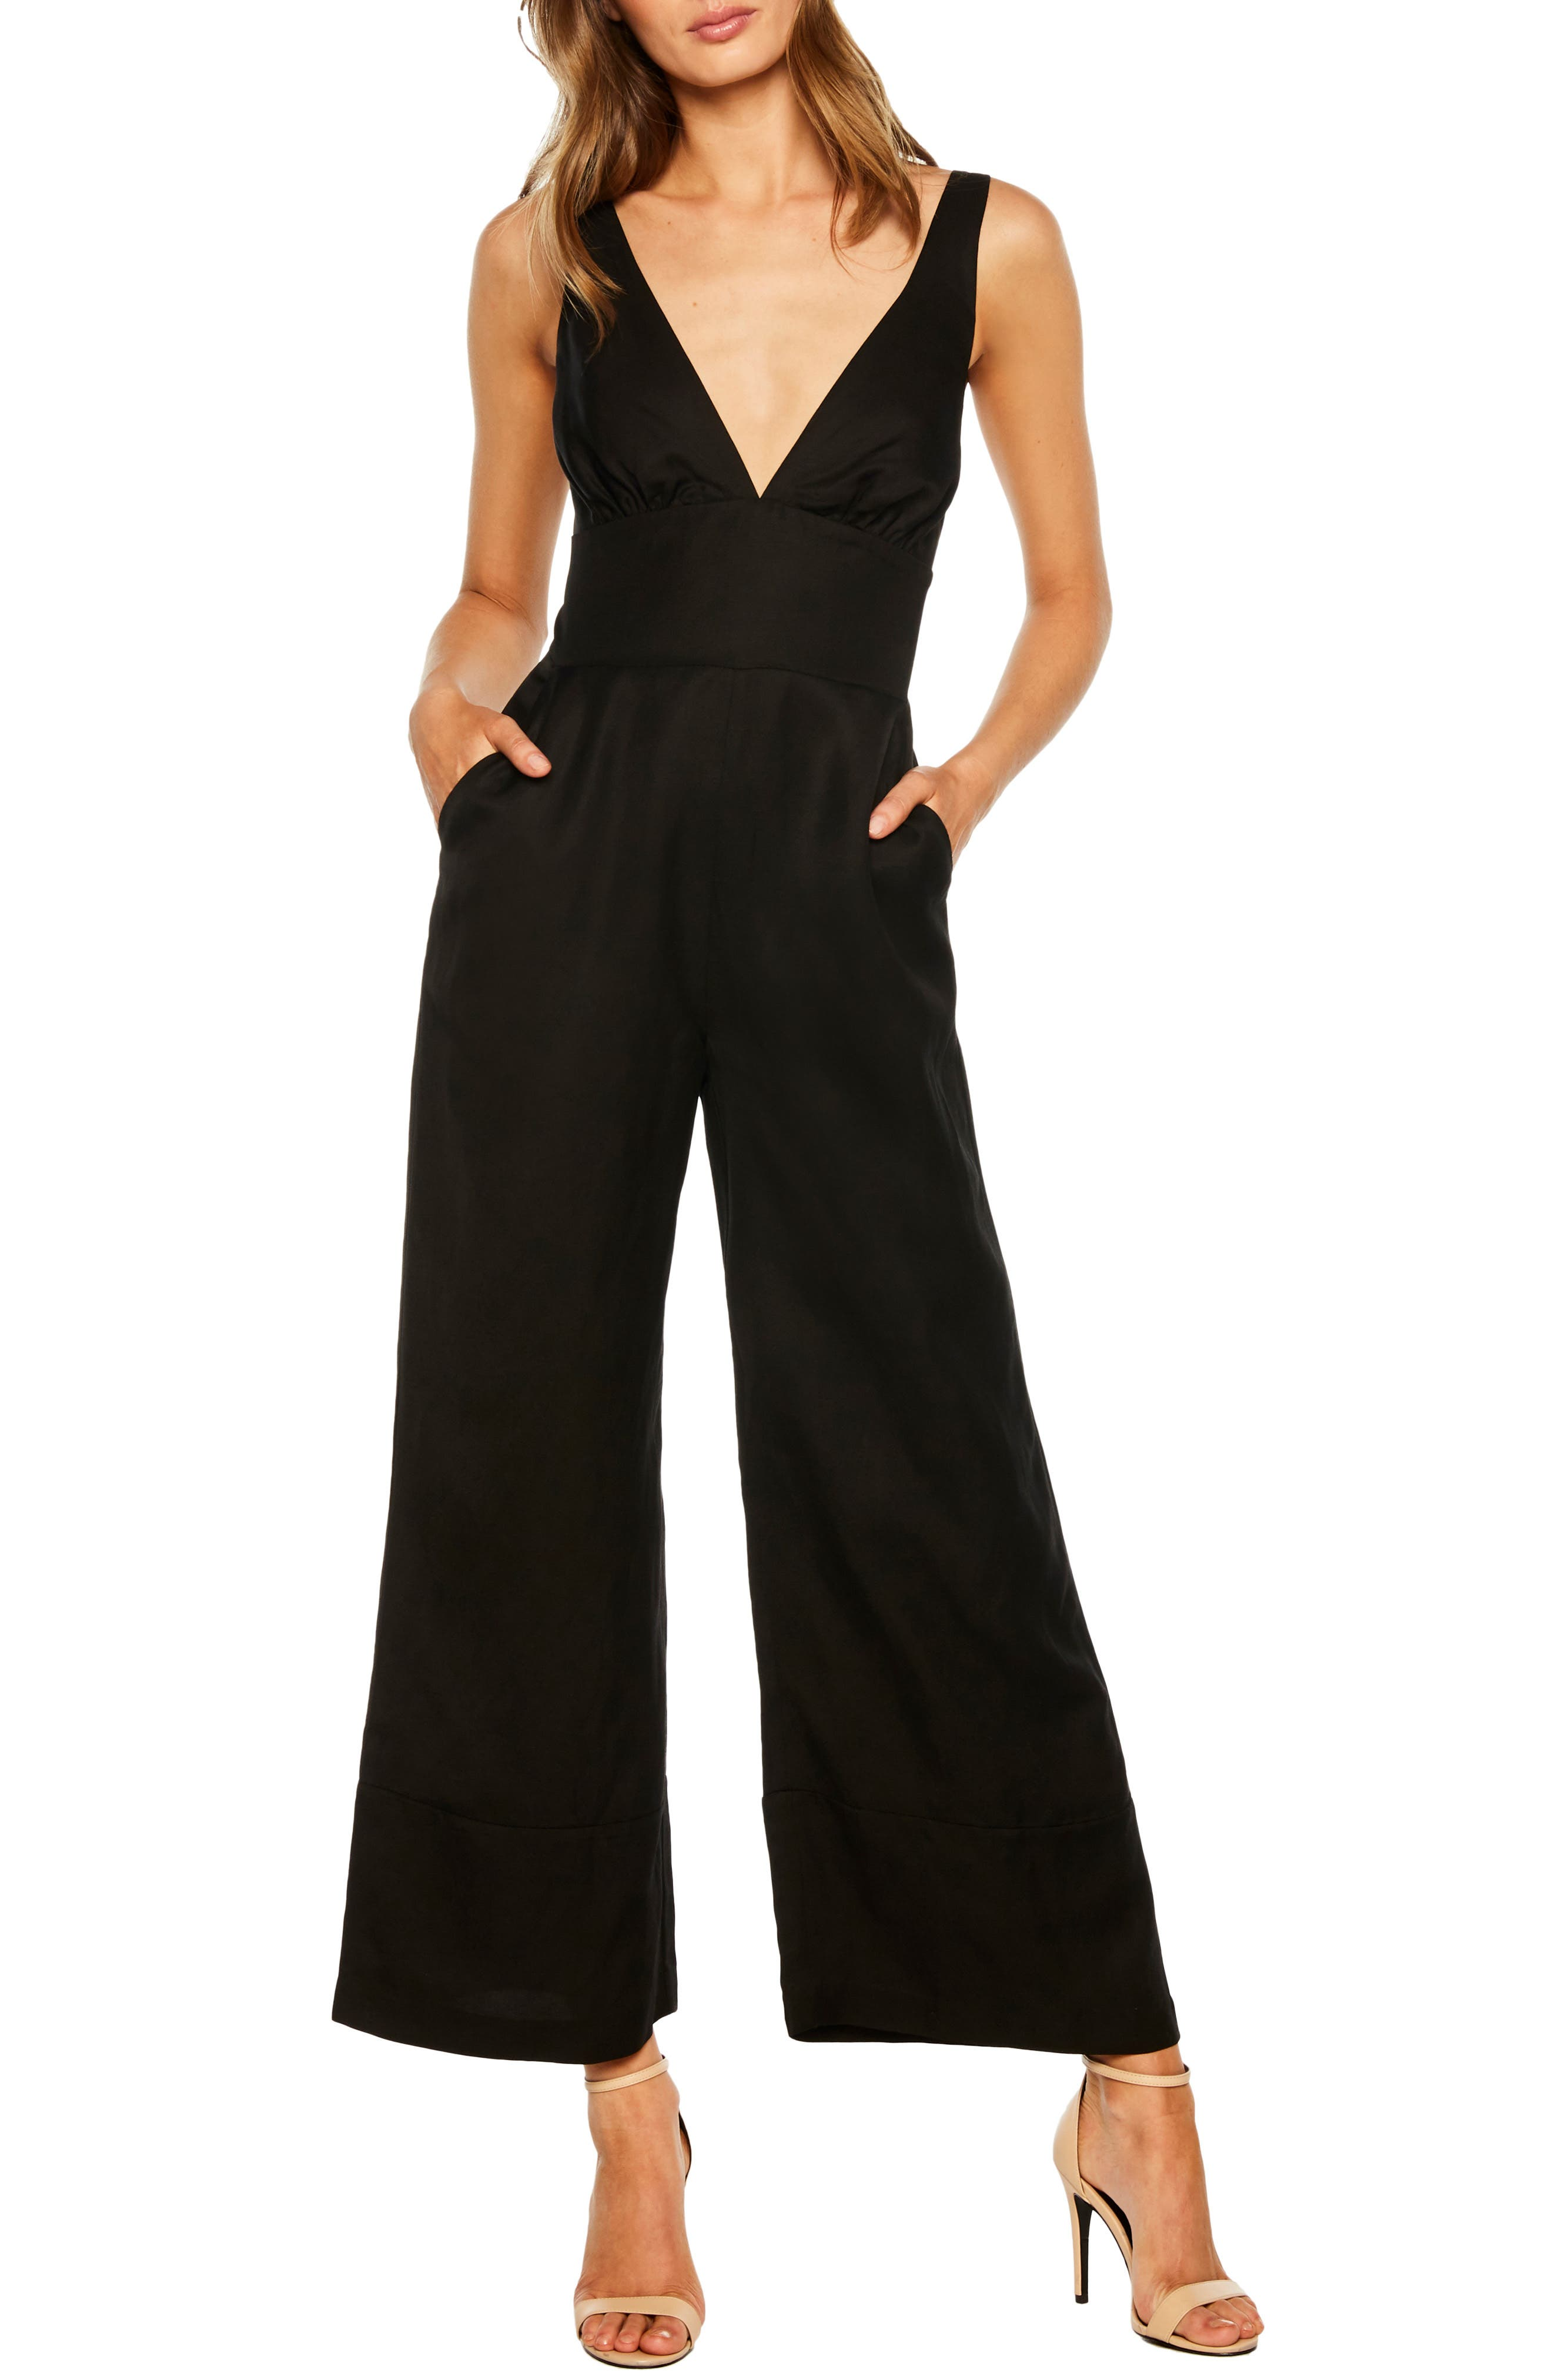 BARDOT Lola Plunging Wide Leg Jumpsuit, Main, color, BLACK